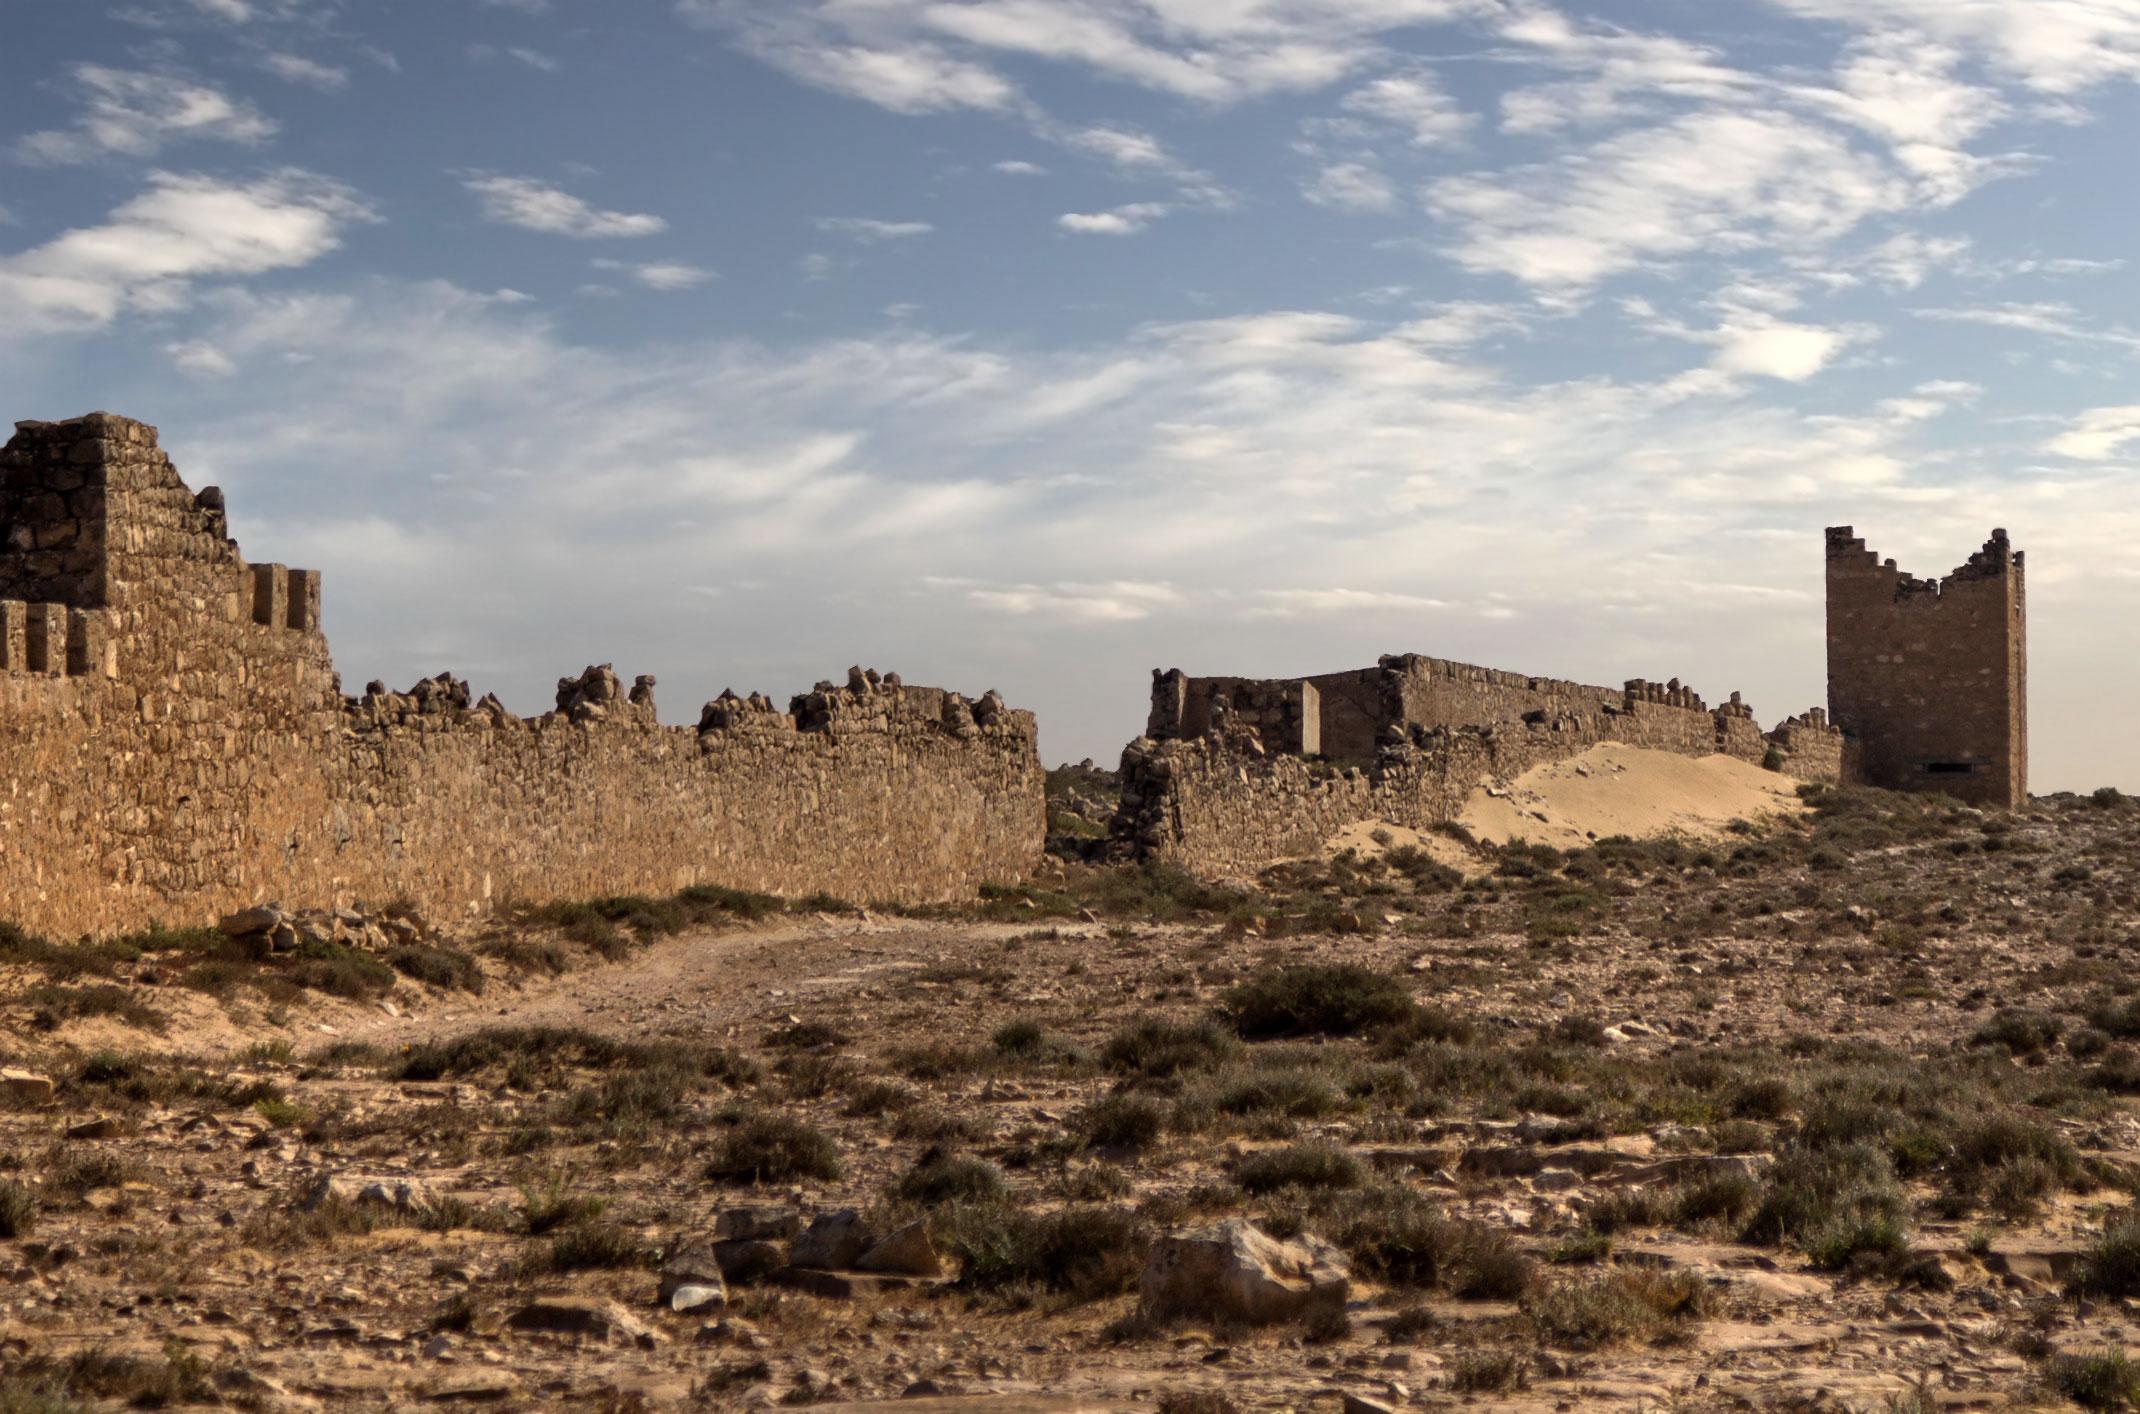 Maroco.Aoreora.Ruiny fortu